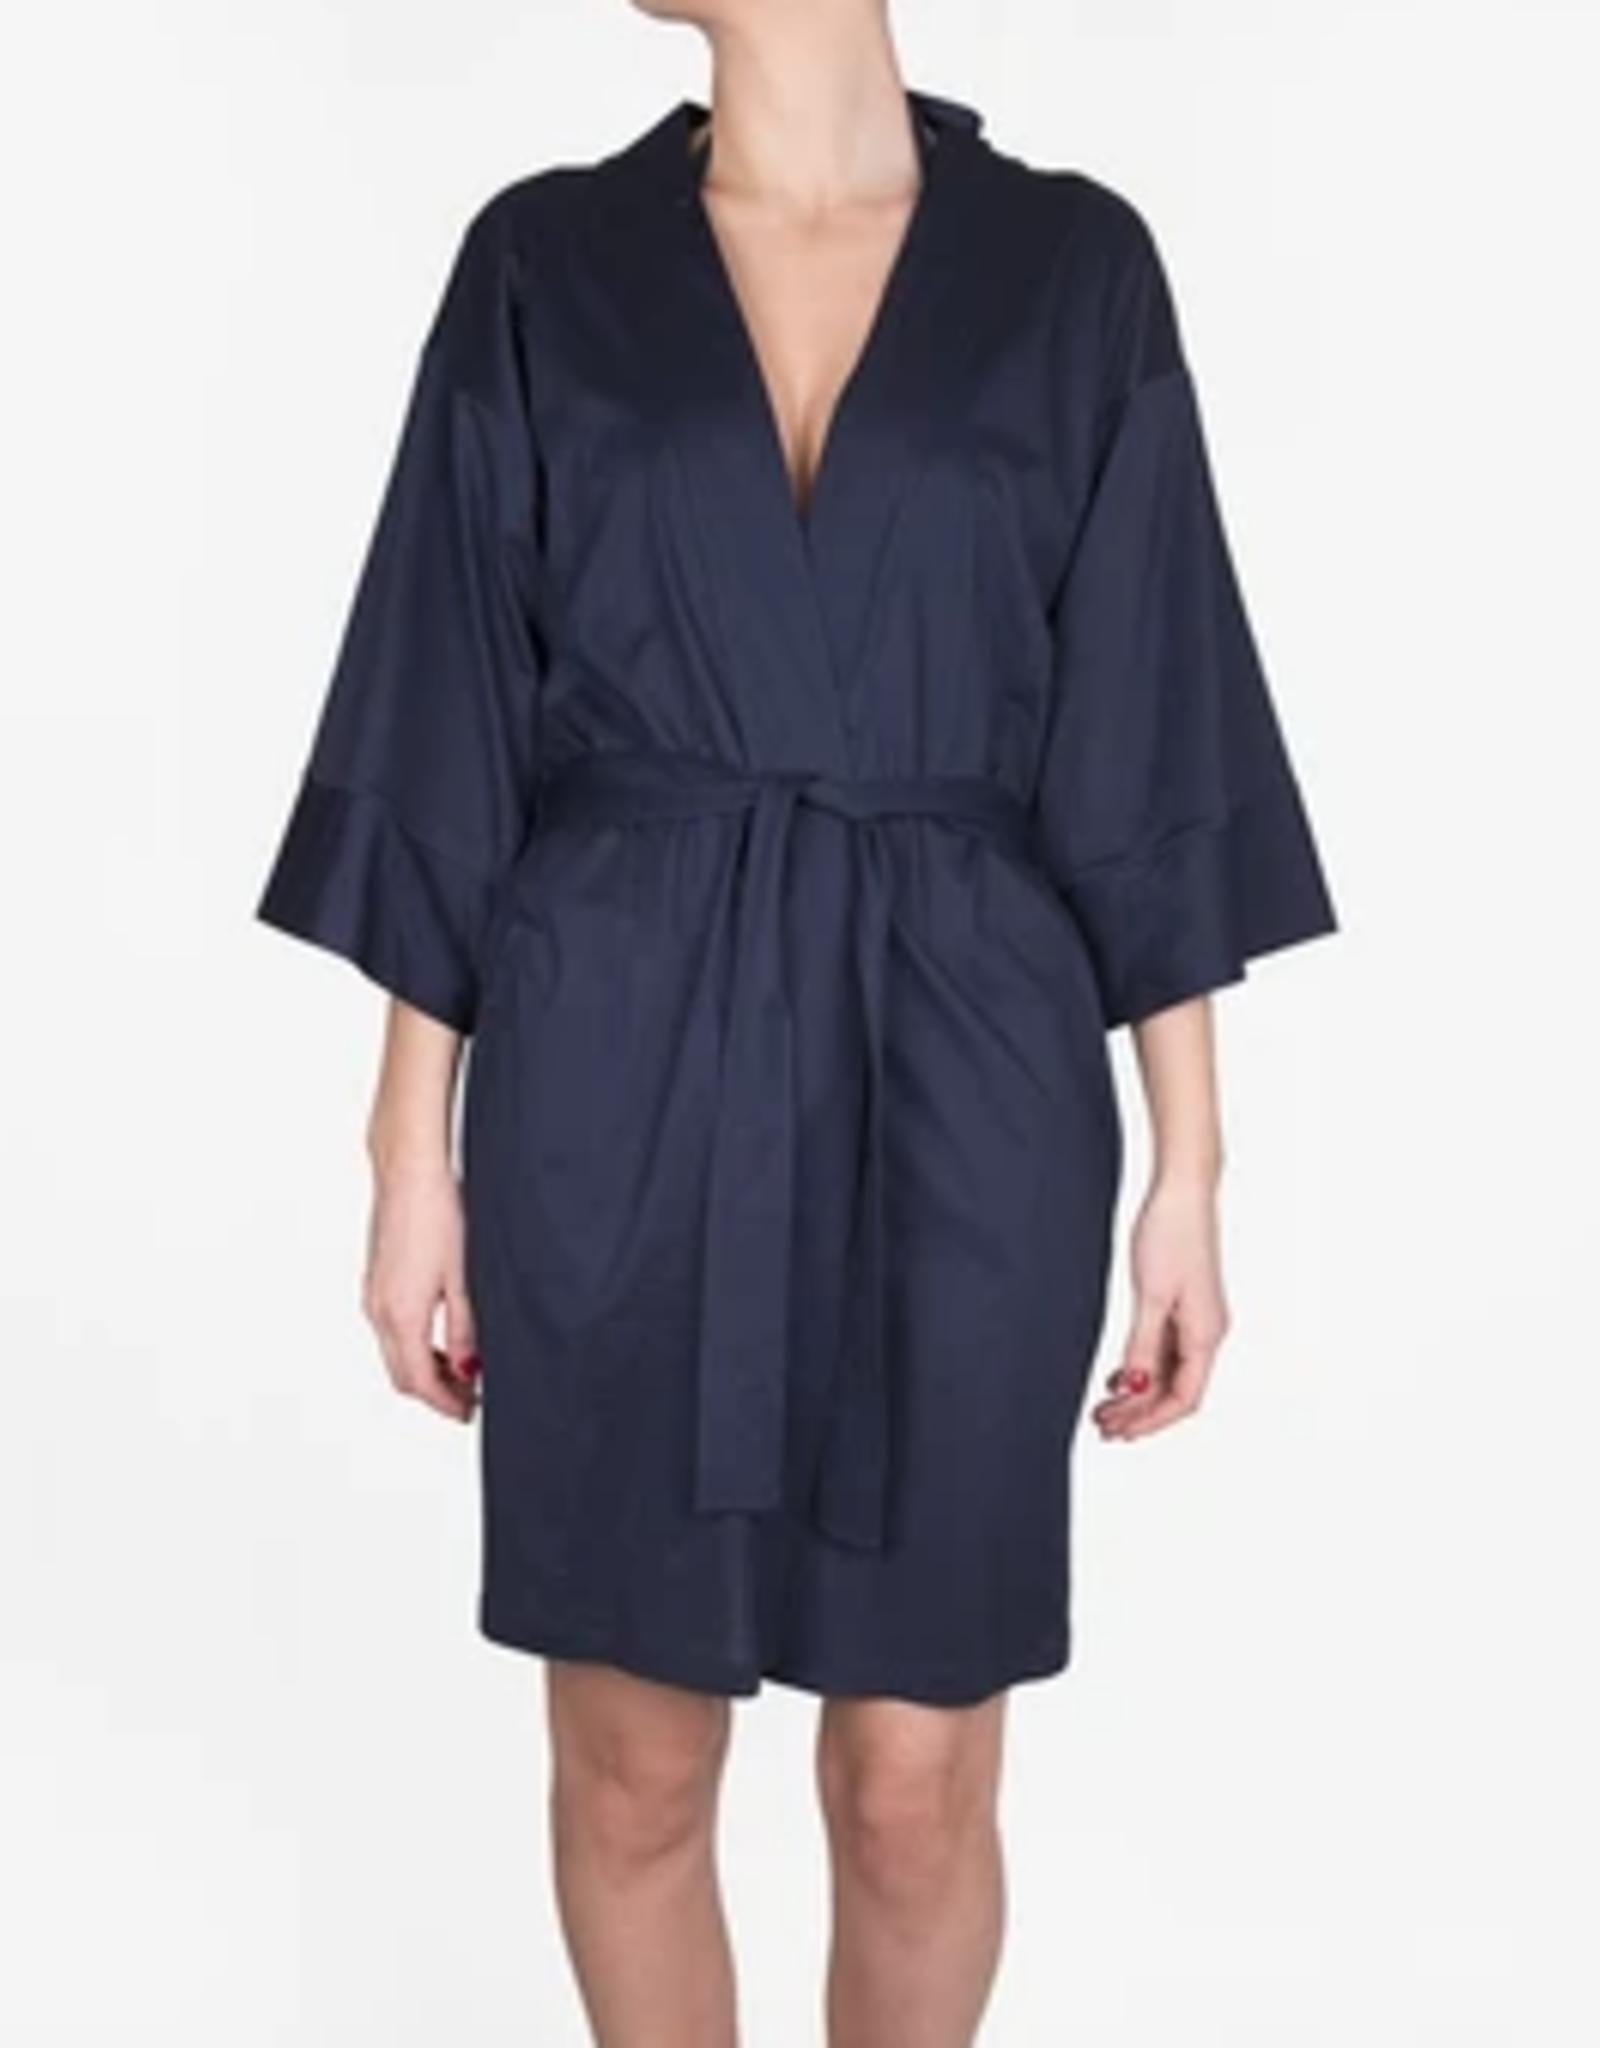 Shan Navy Balnea Doux Confort Kimono Cover Up